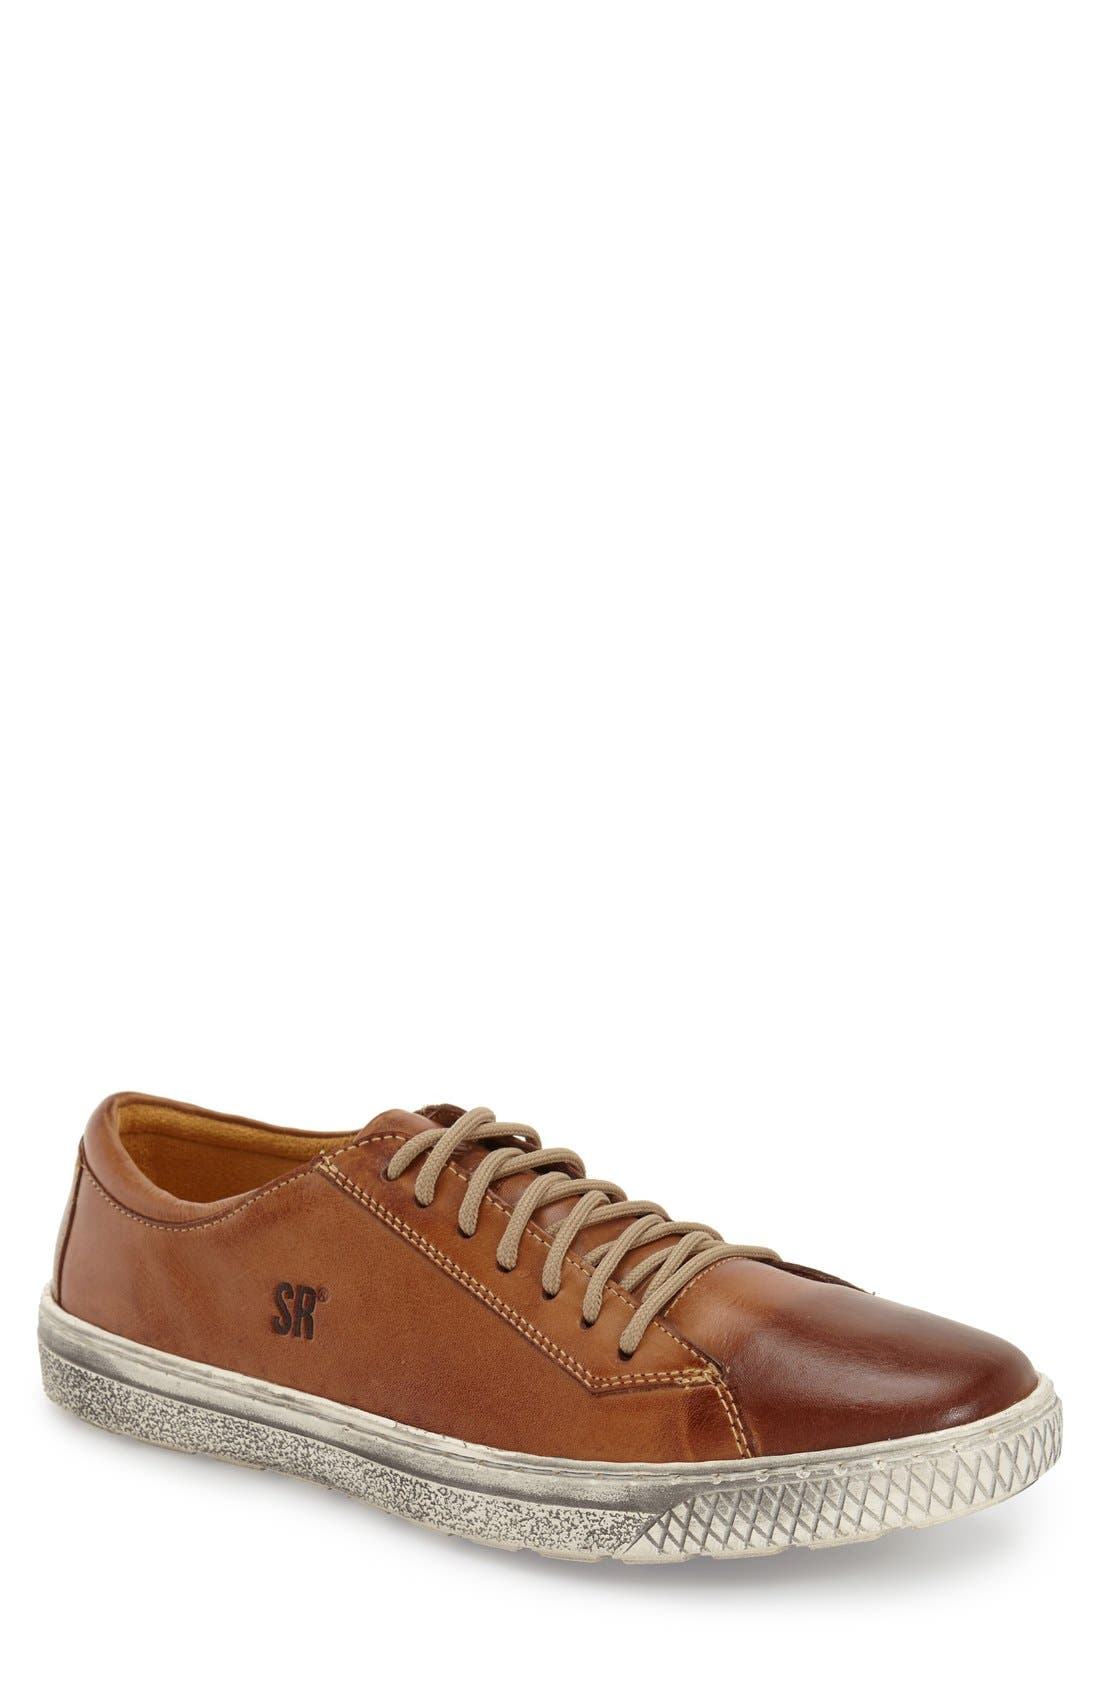 'Rolly' Sneaker,                             Main thumbnail 1, color,                             Tan